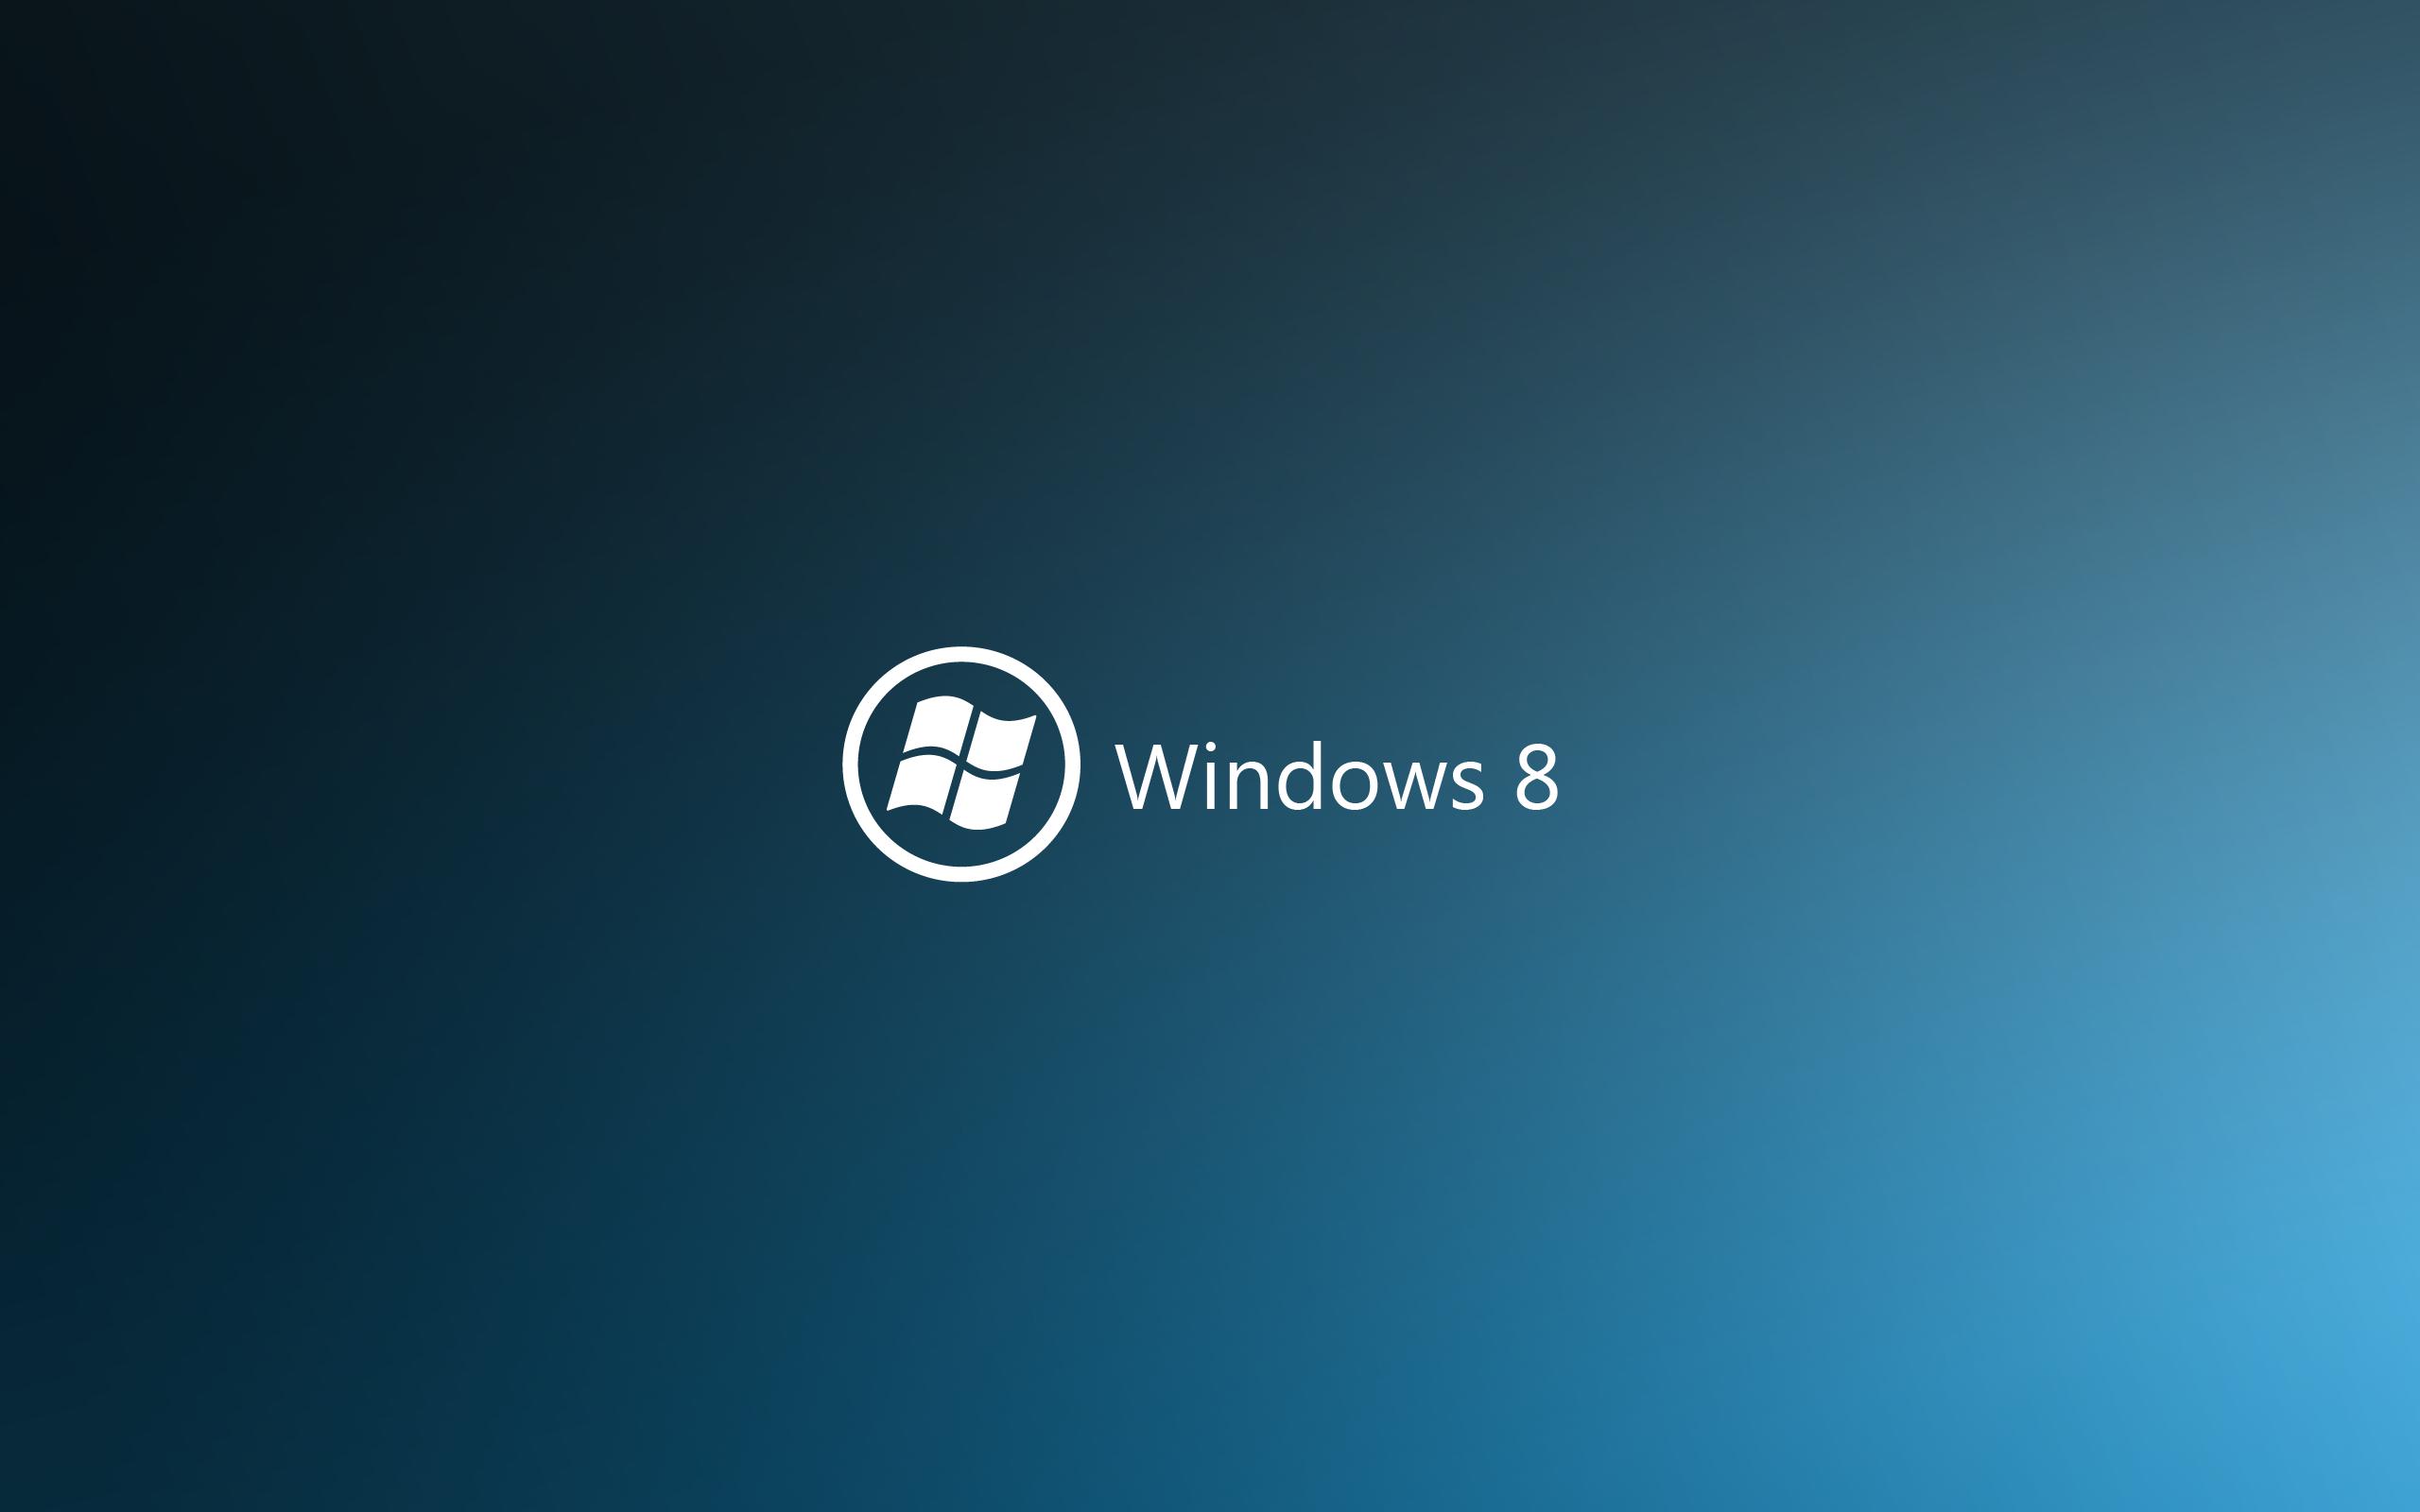 Windows8-Wallpapers-HD (11)